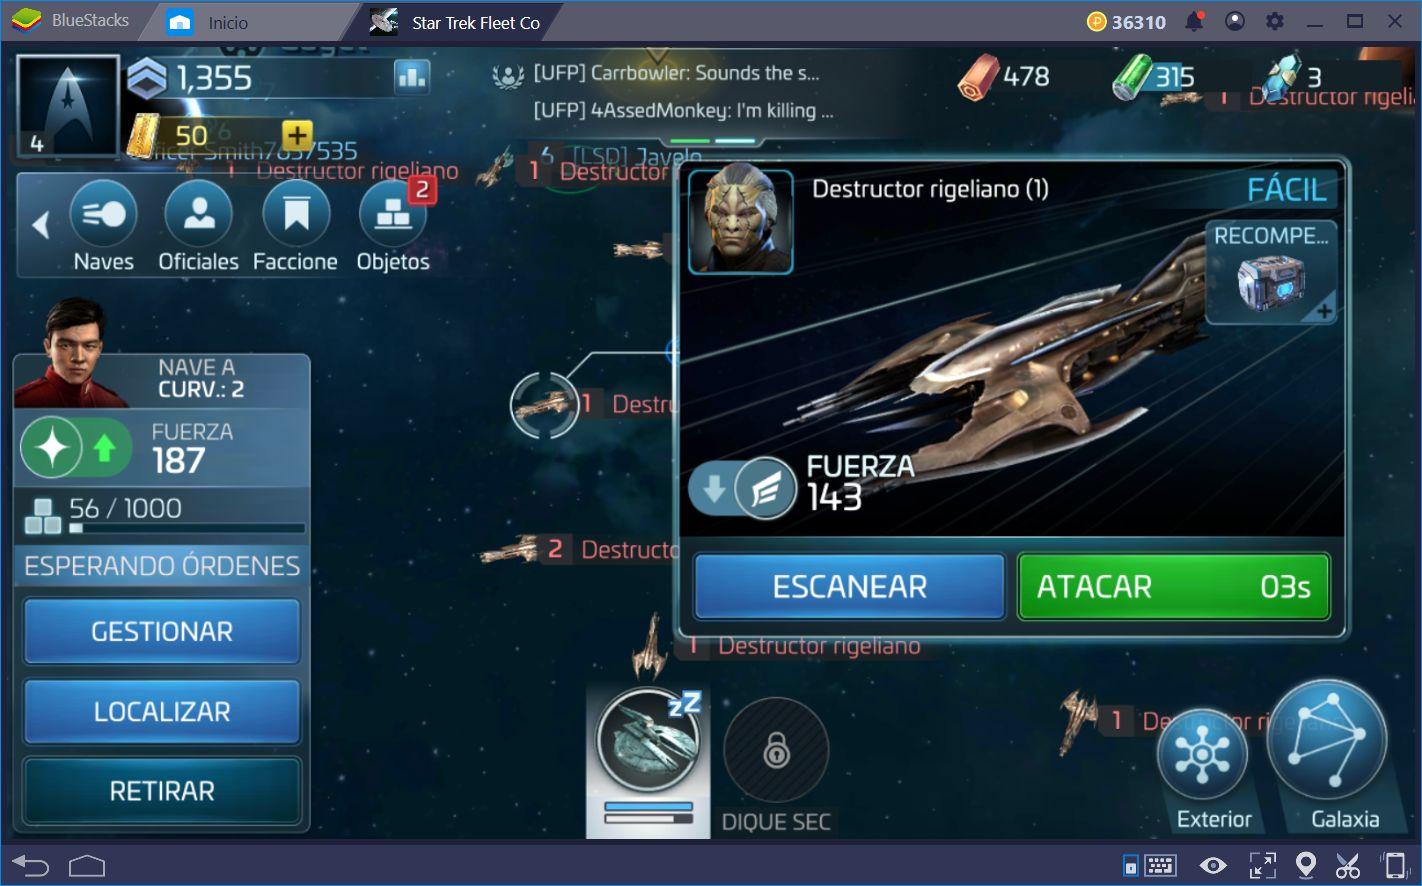 Sorpresas Agradables en Star Trek Fleet Command